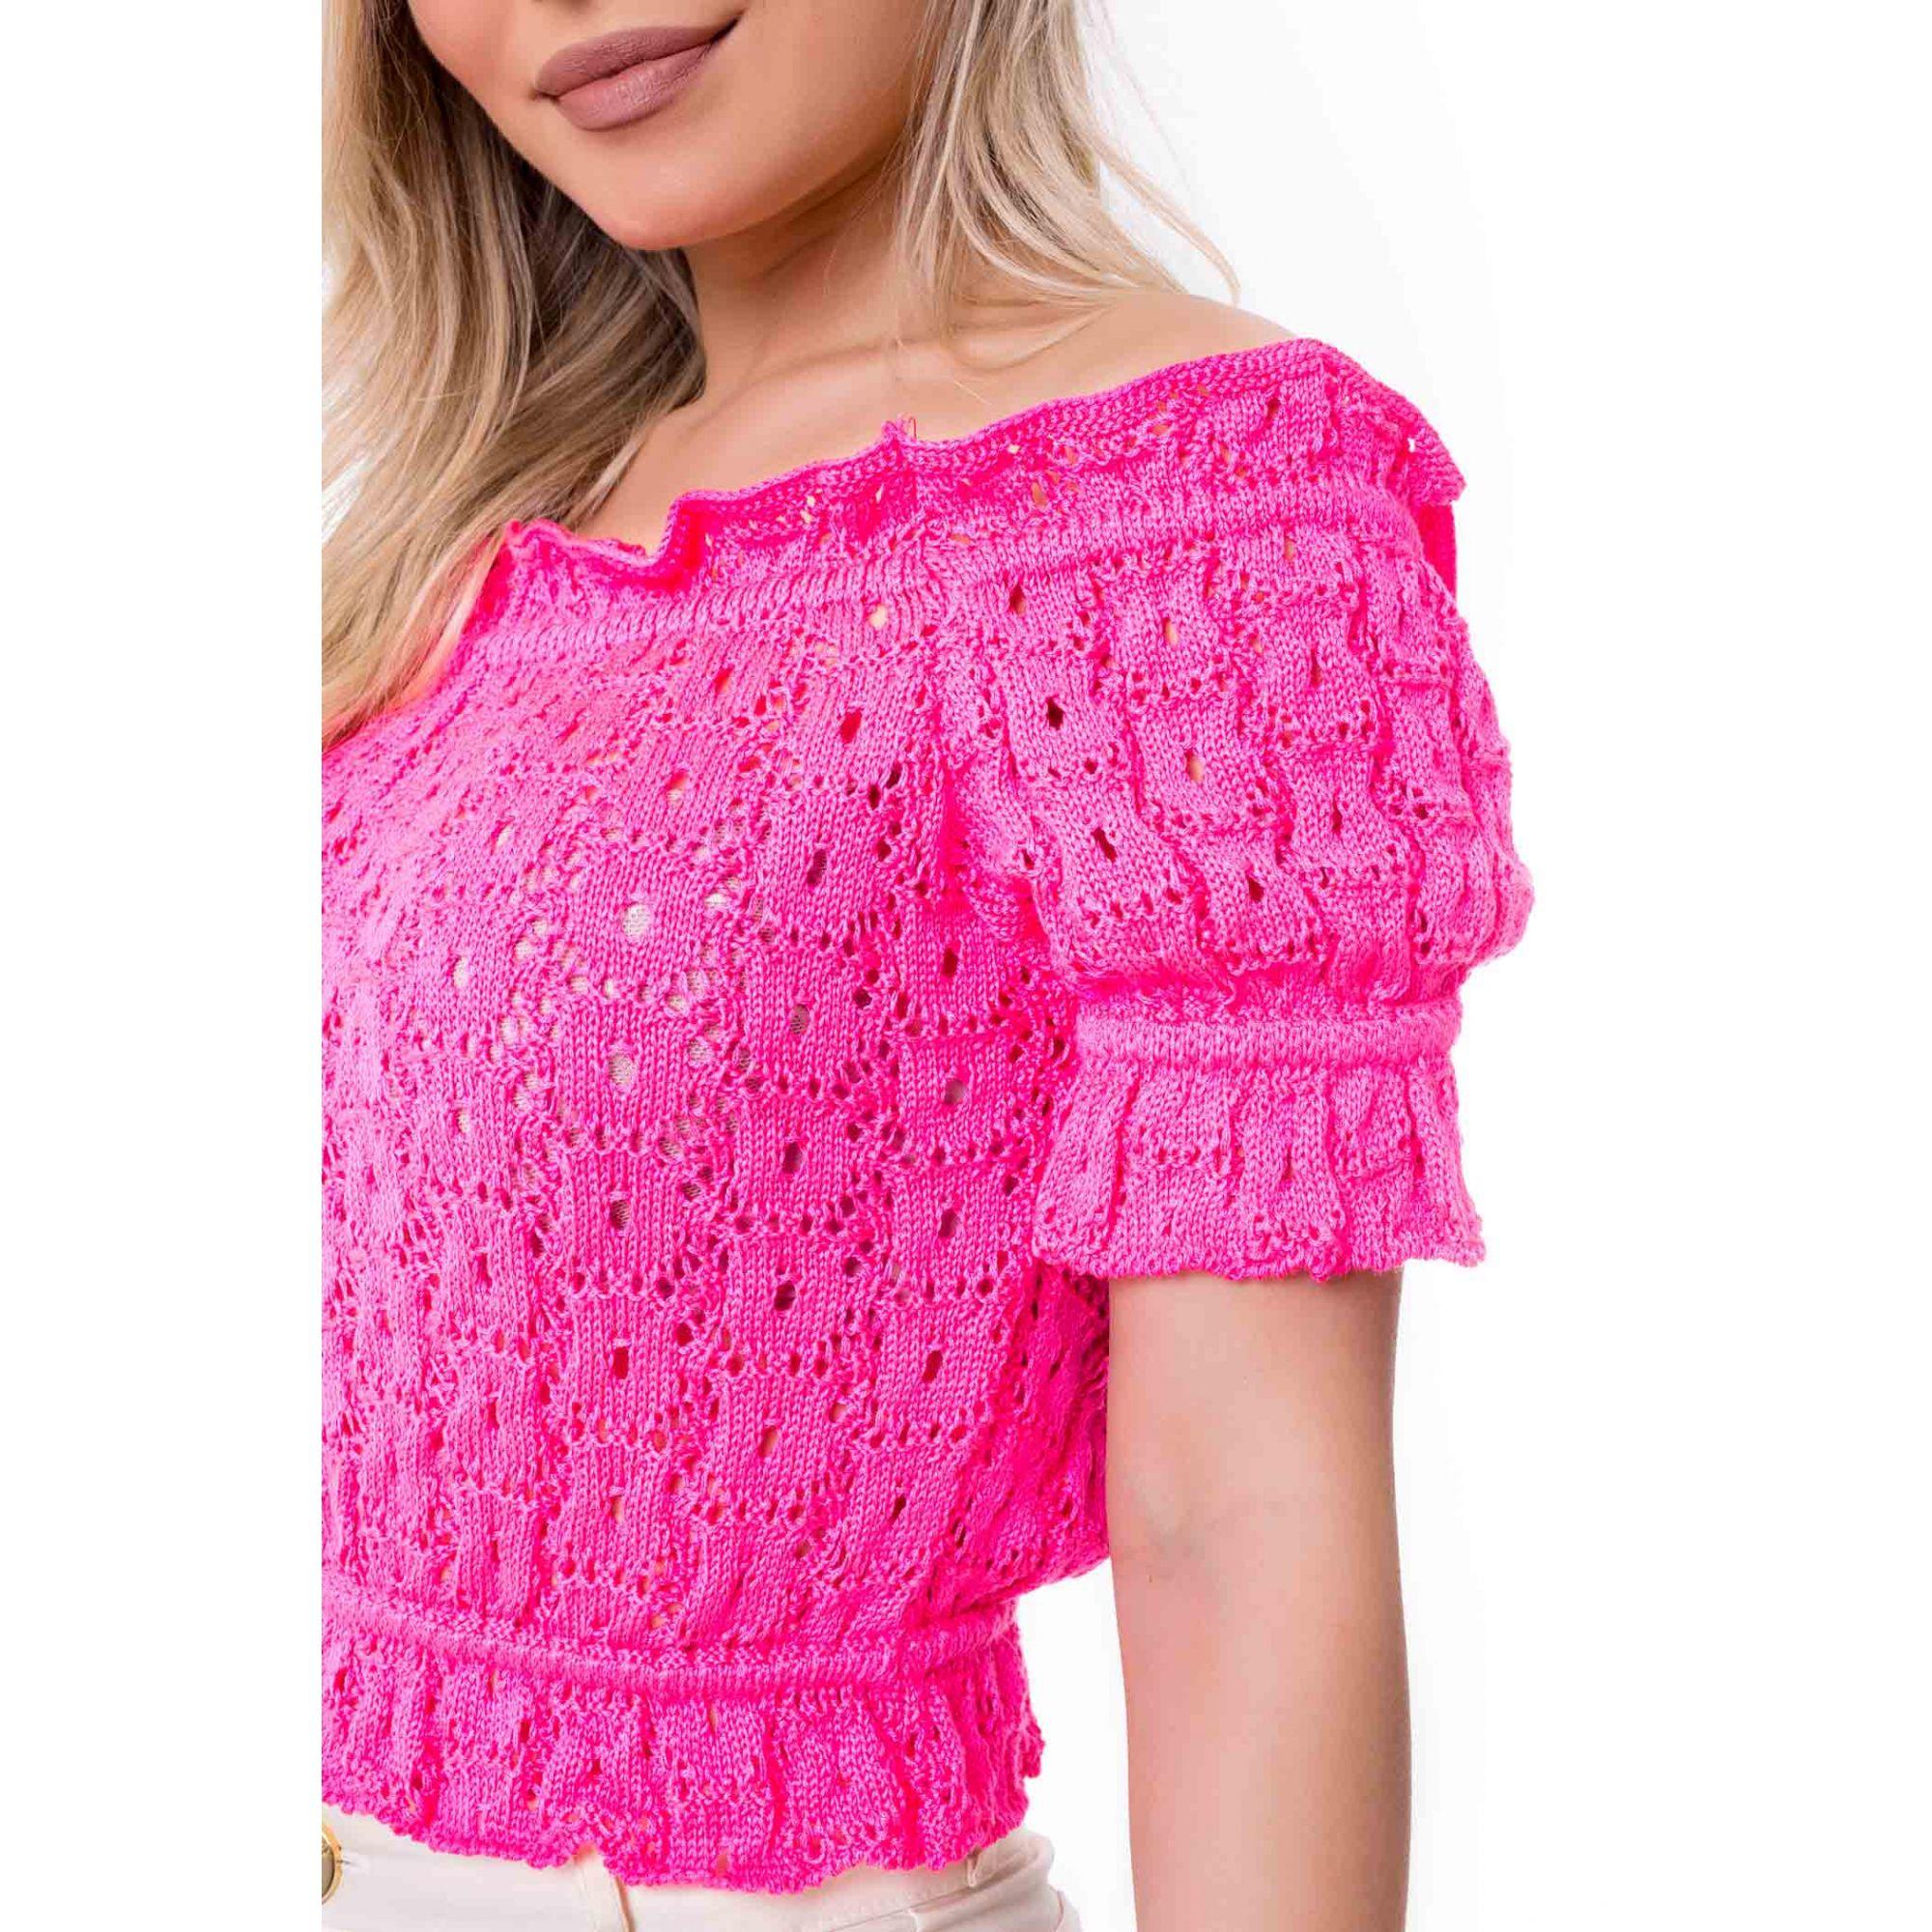 Blusa Cropped Vera Tricot Ombro a Ombro Franzidos Feminino Pink